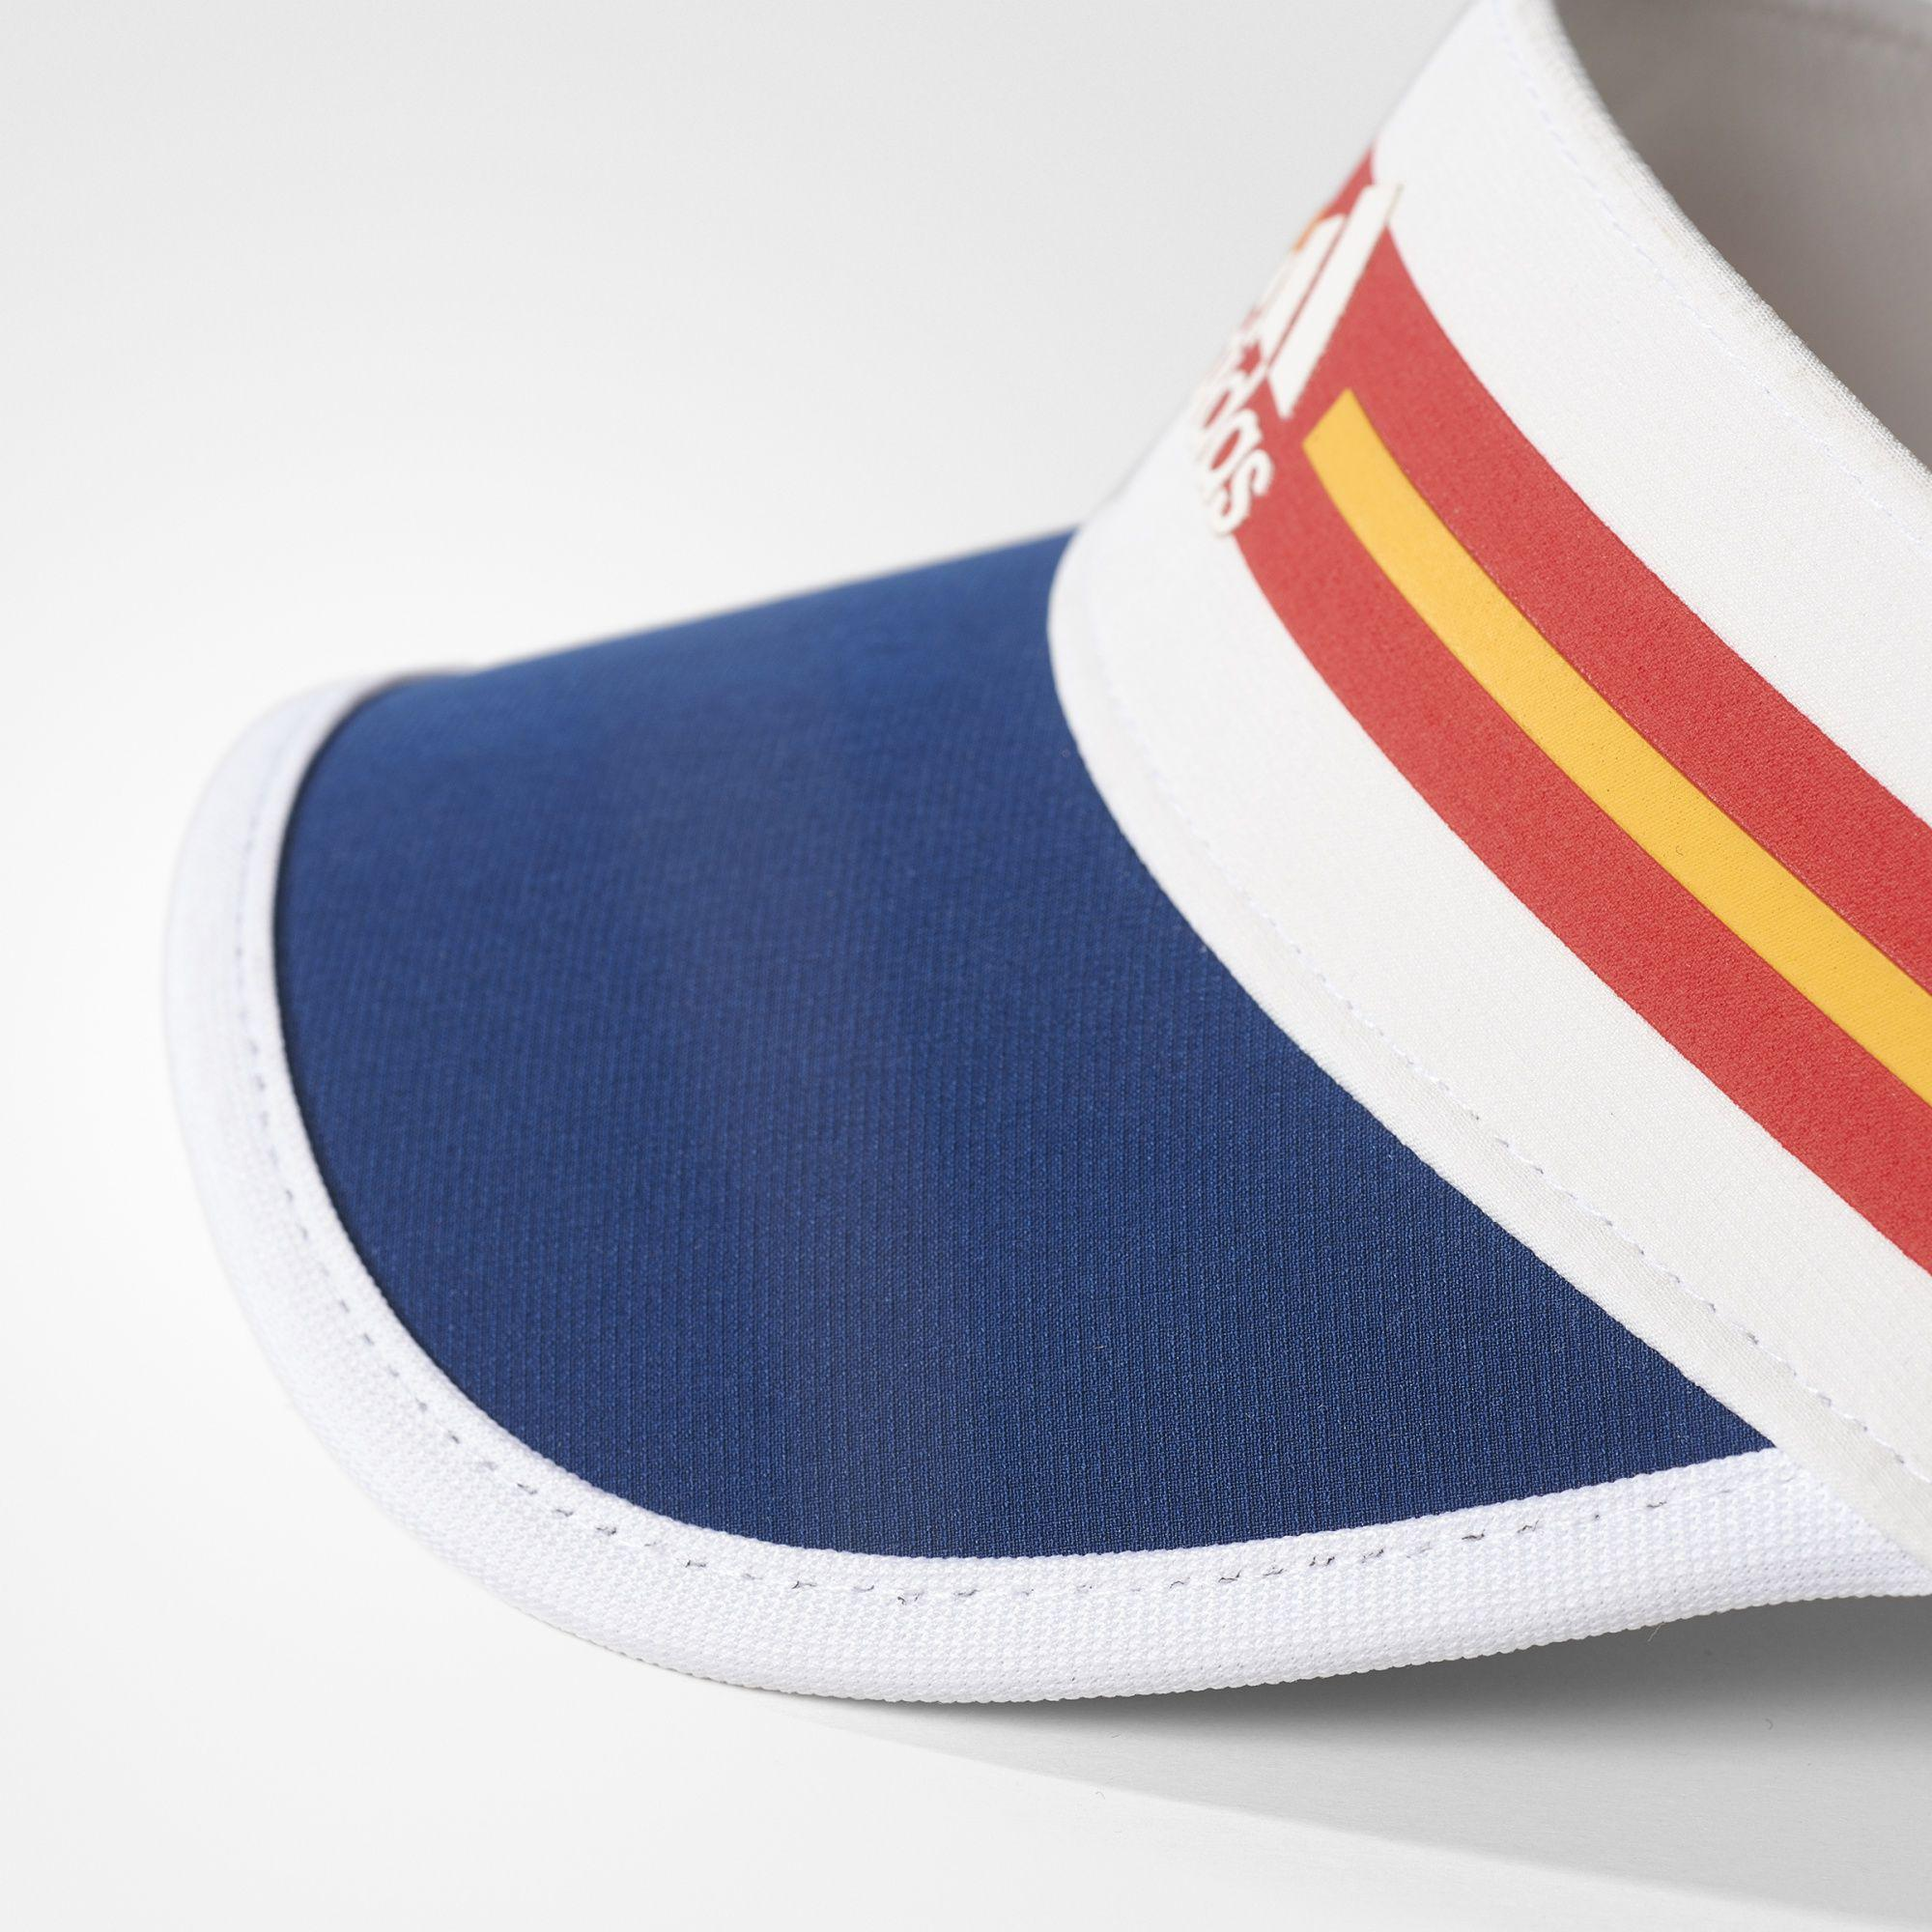 bbba18f0022 Adidas Womens New York Climalite Visor - White Multi-Colour ...